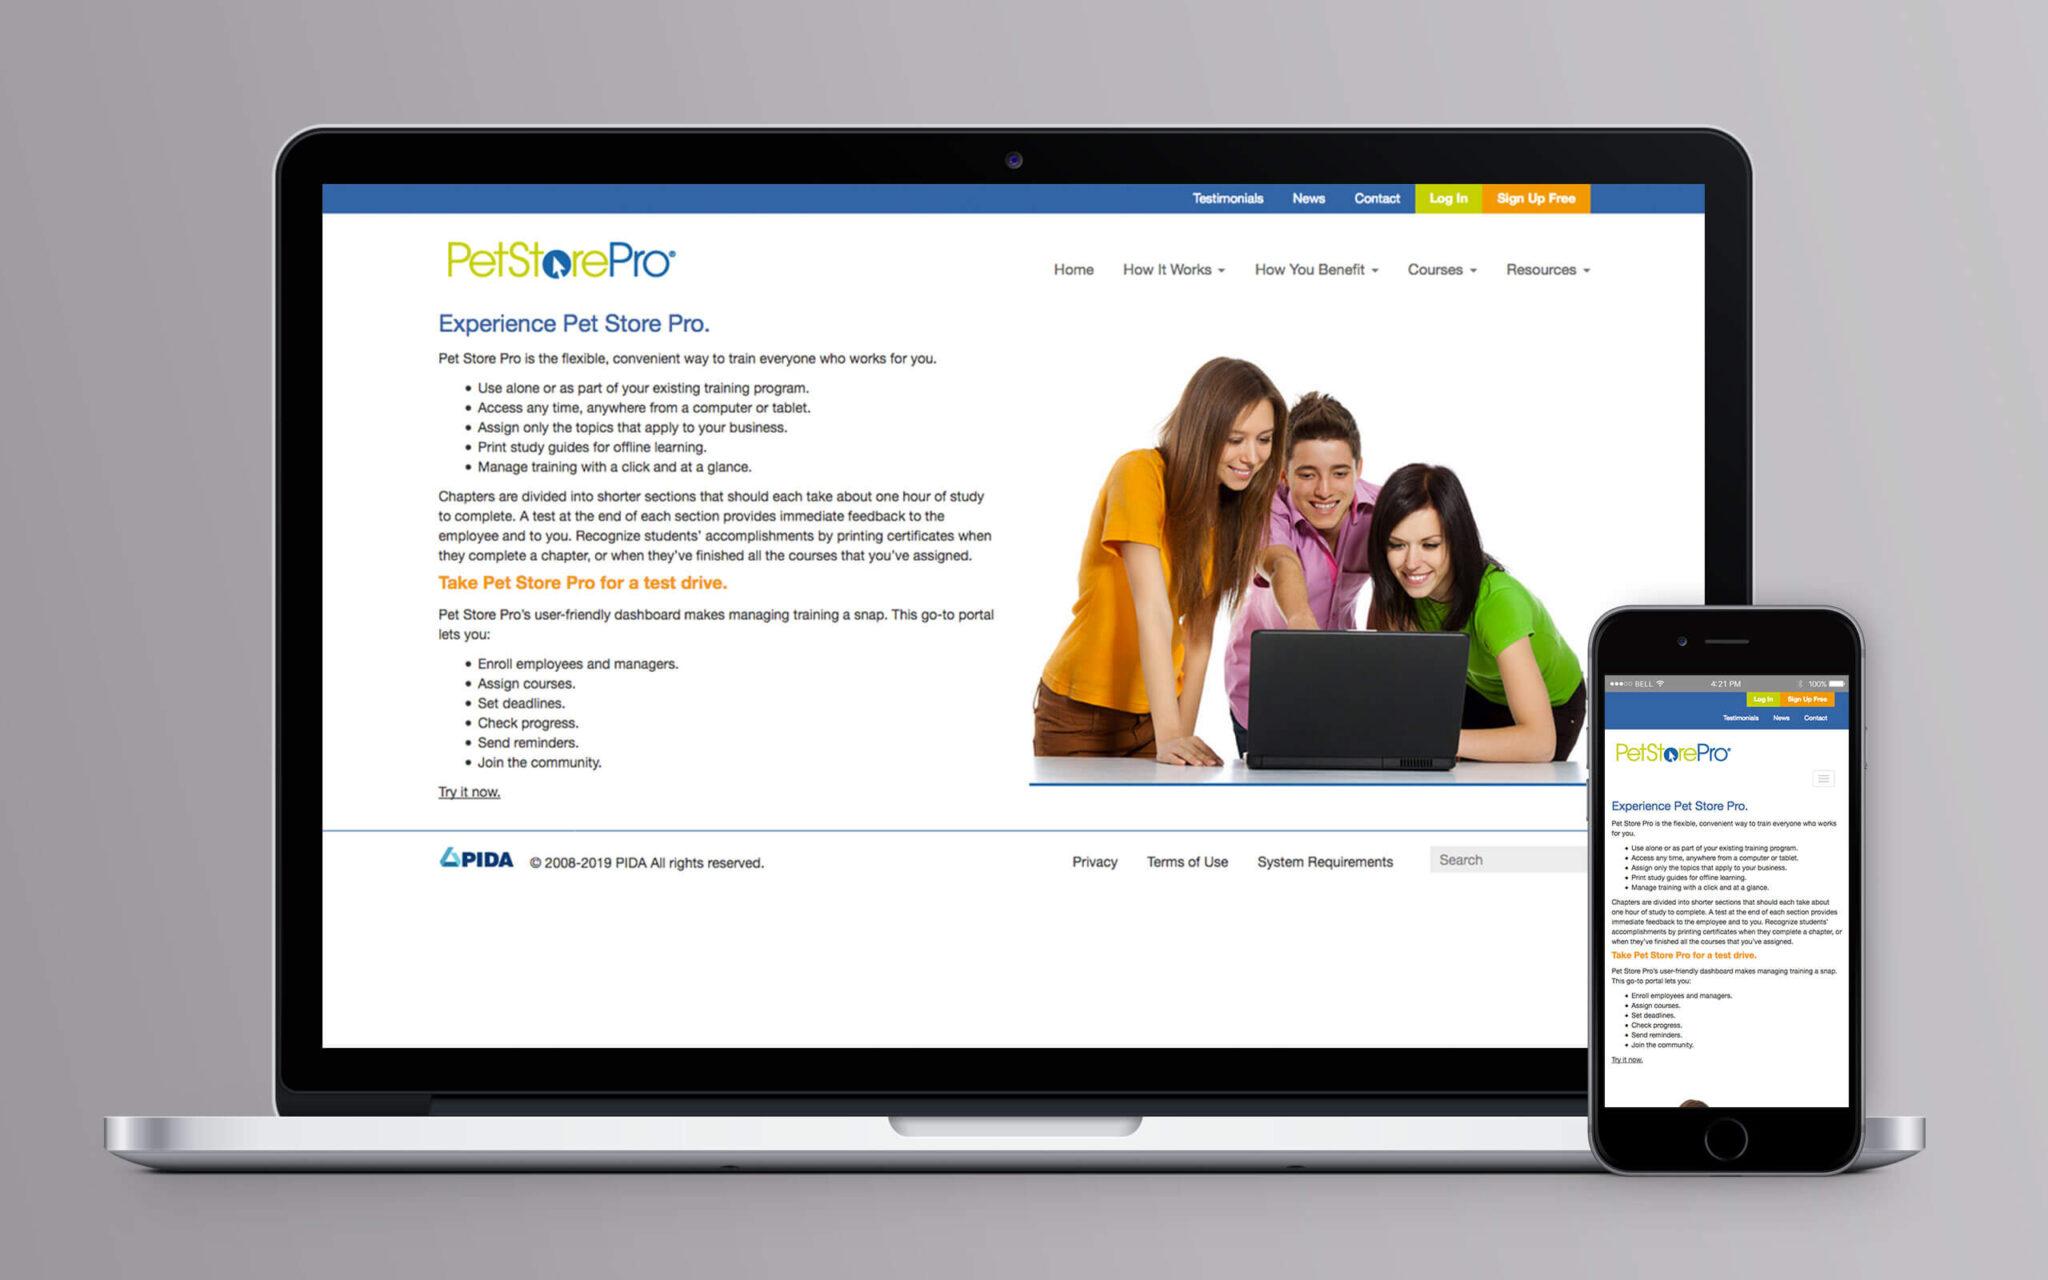 Pet Store Pro Website Experience